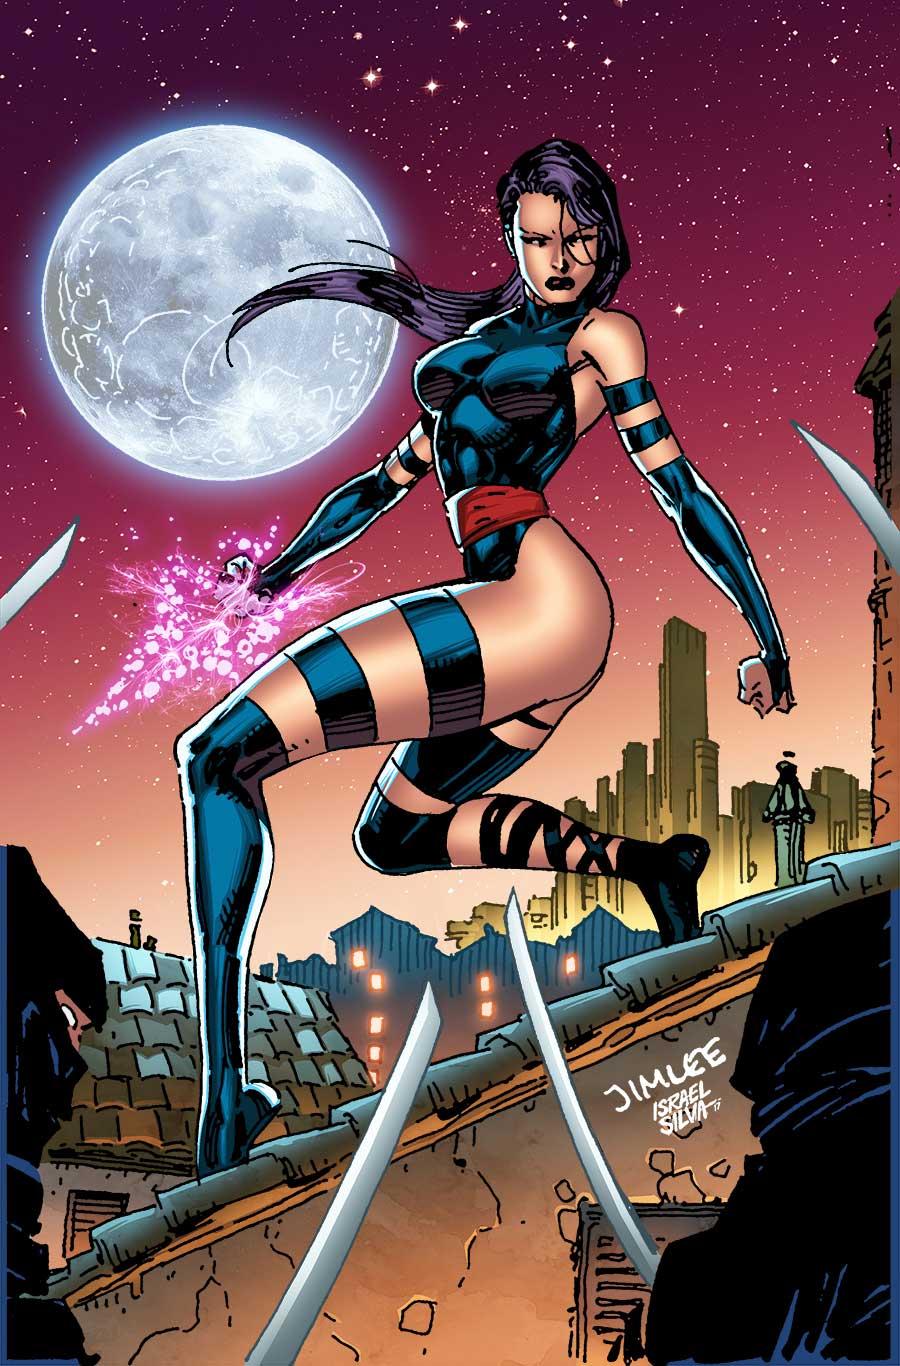 Peter_Parker_Spectacular_Spider-Man_2_X-Men_Trading_Card_Variant July brings astonishing Jim Lee X-MEN TRADING CARD VARIANT COVERS